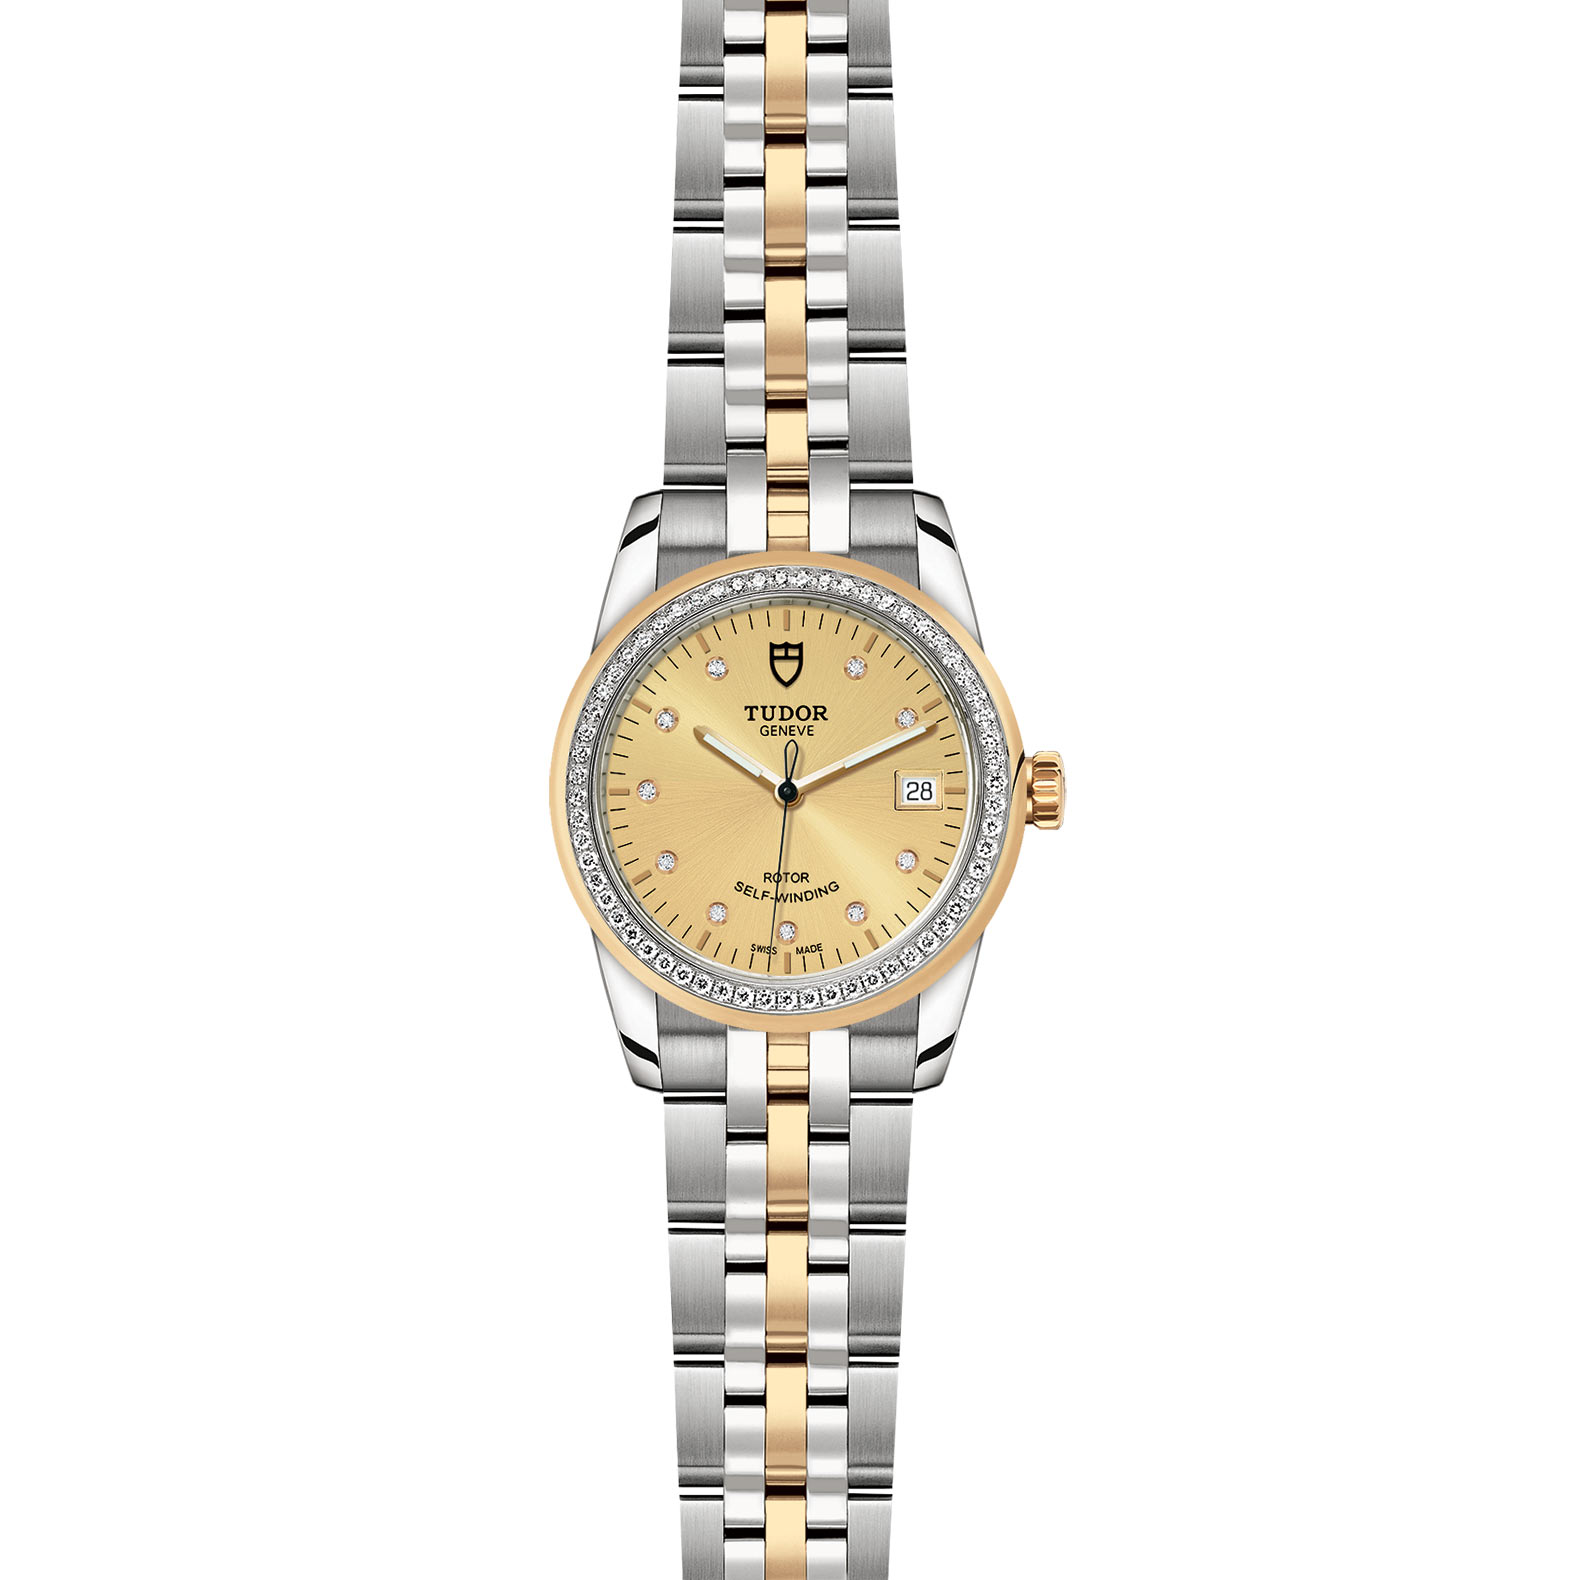 TUDOR Glamour Date M55023 0026 Frontfacing